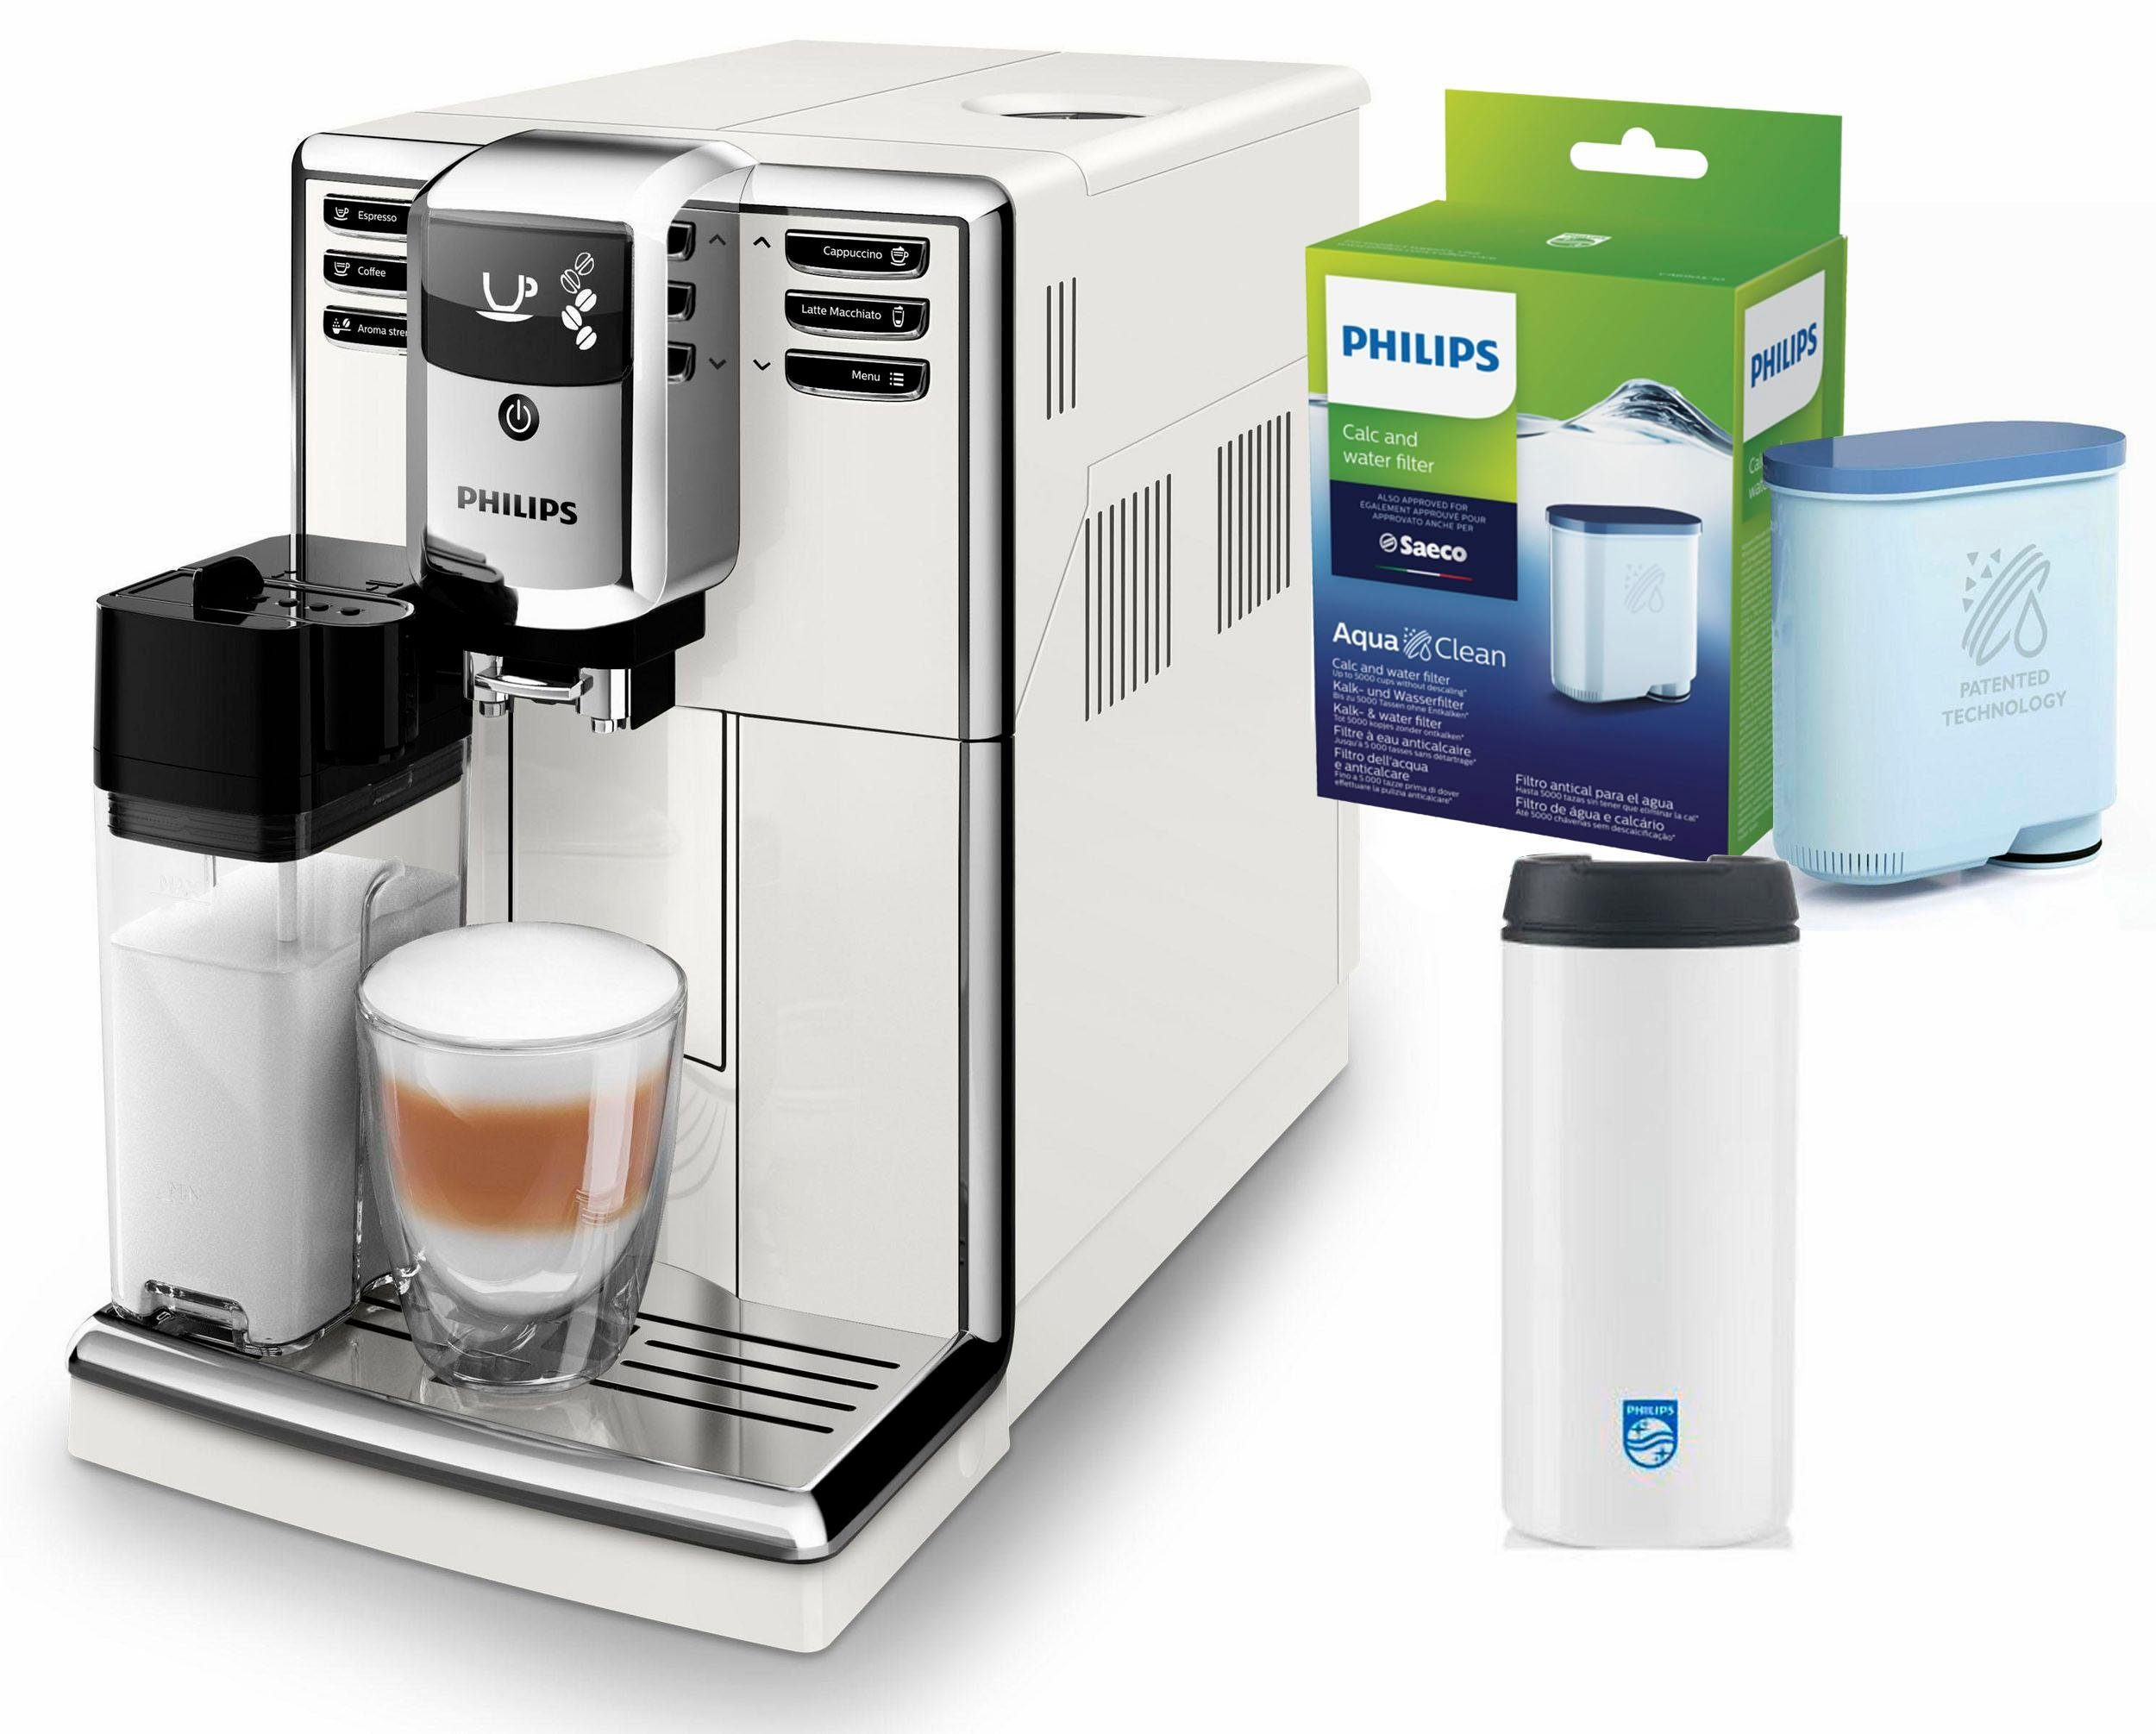 Philips Kaffeevollautomat 5000 Serie EP5961/10, weiß